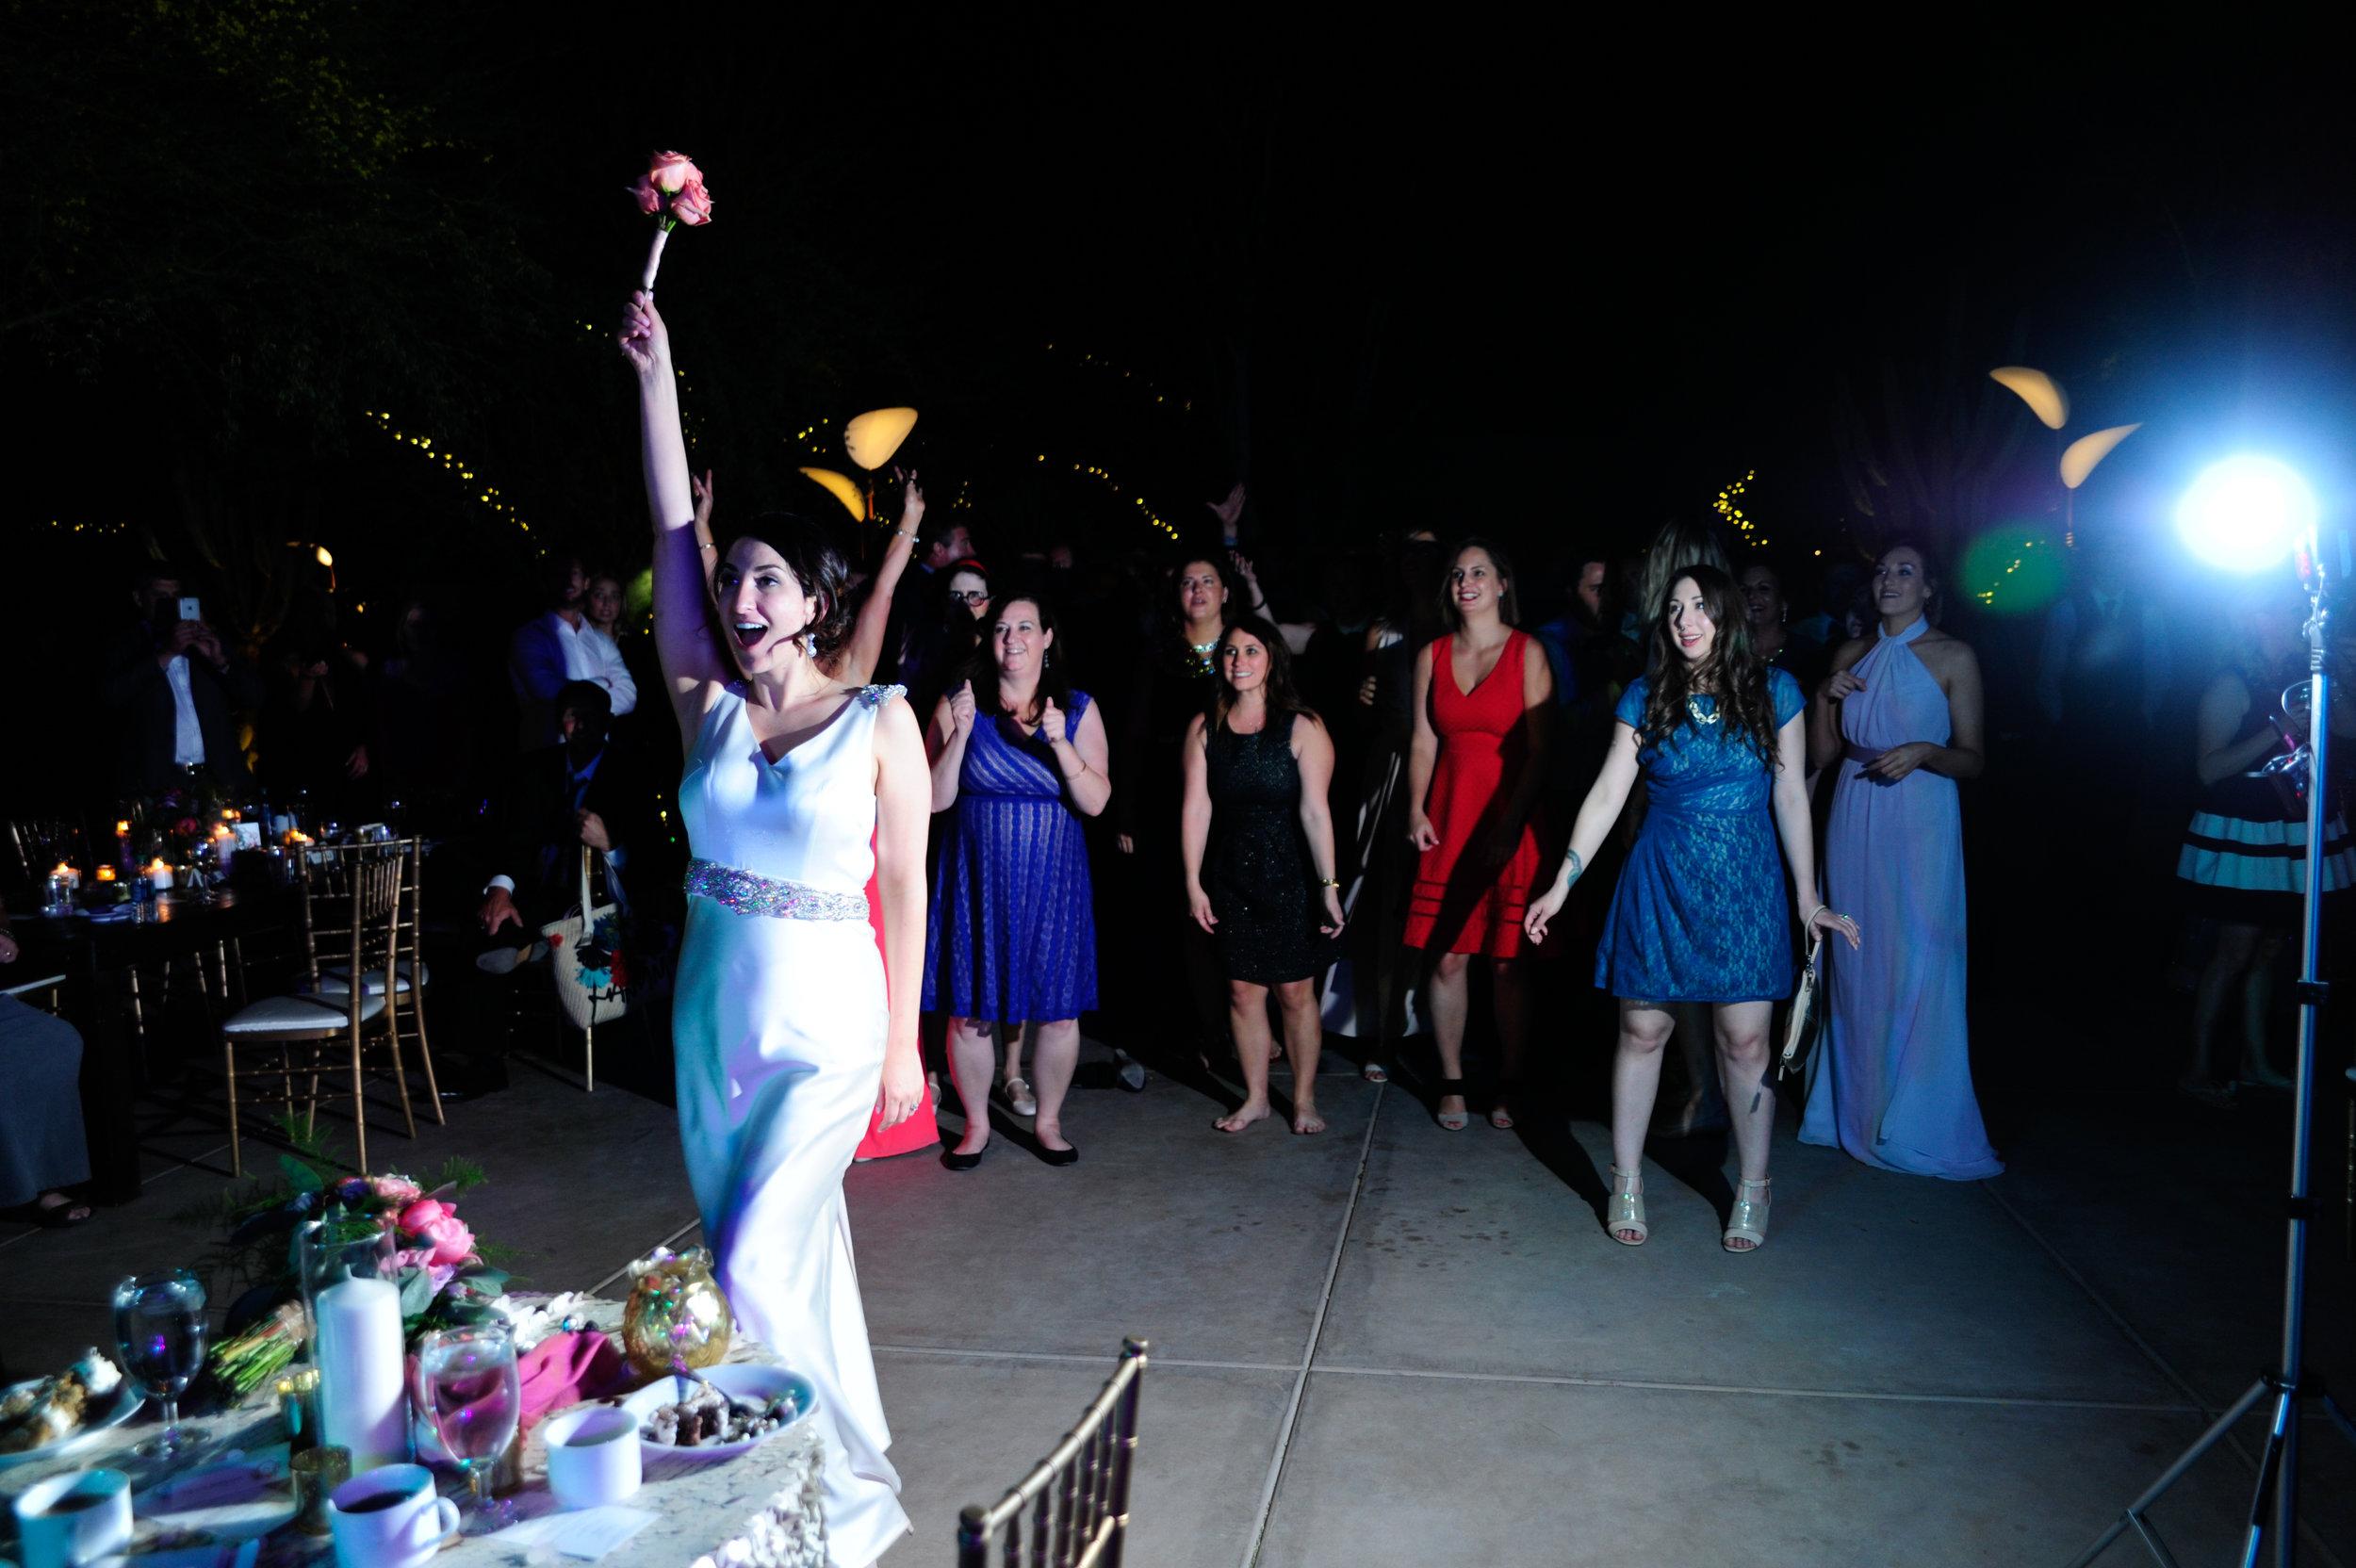 37 bouquet toss bride tossing bouquet throw bouquet Mod Wed Photography Life Design Events.jpg